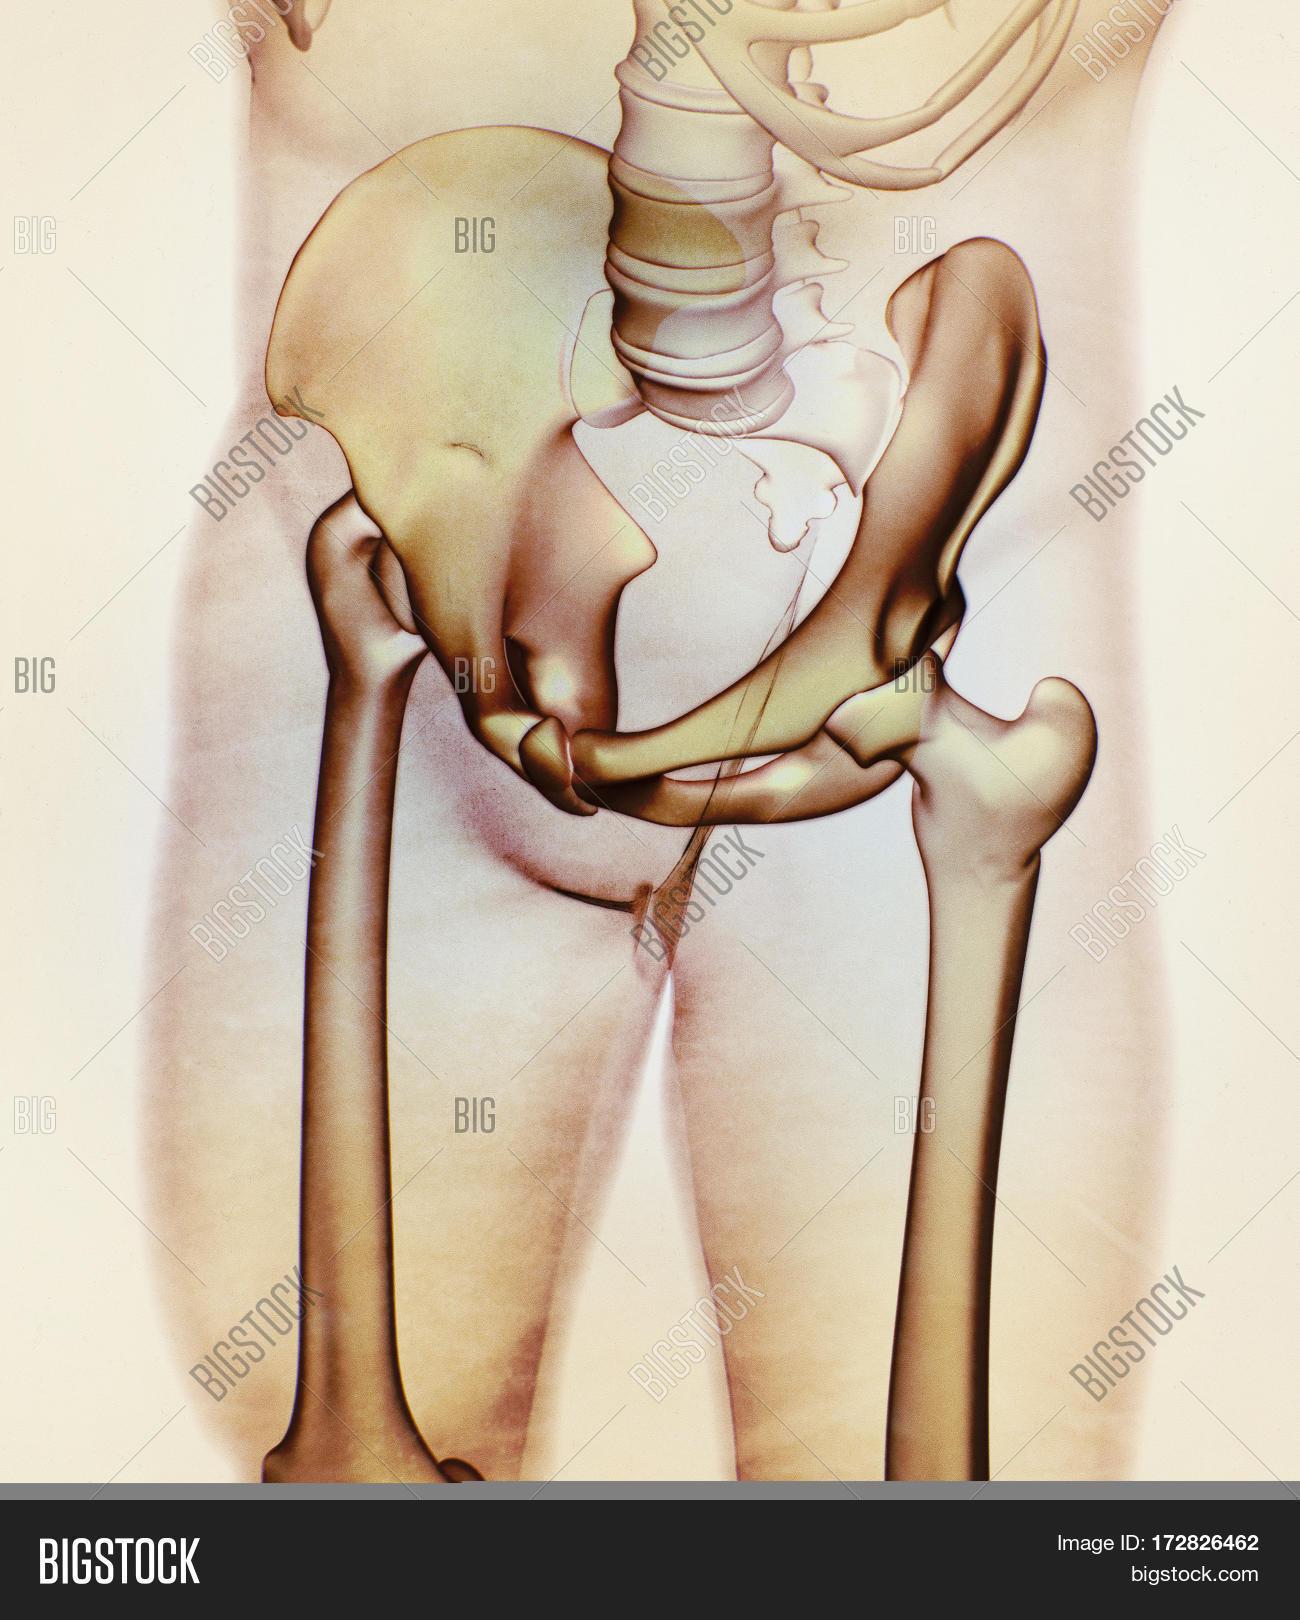 Ilium Bone, Hip Bone Image & Photo (Free Trial) | Bigstock